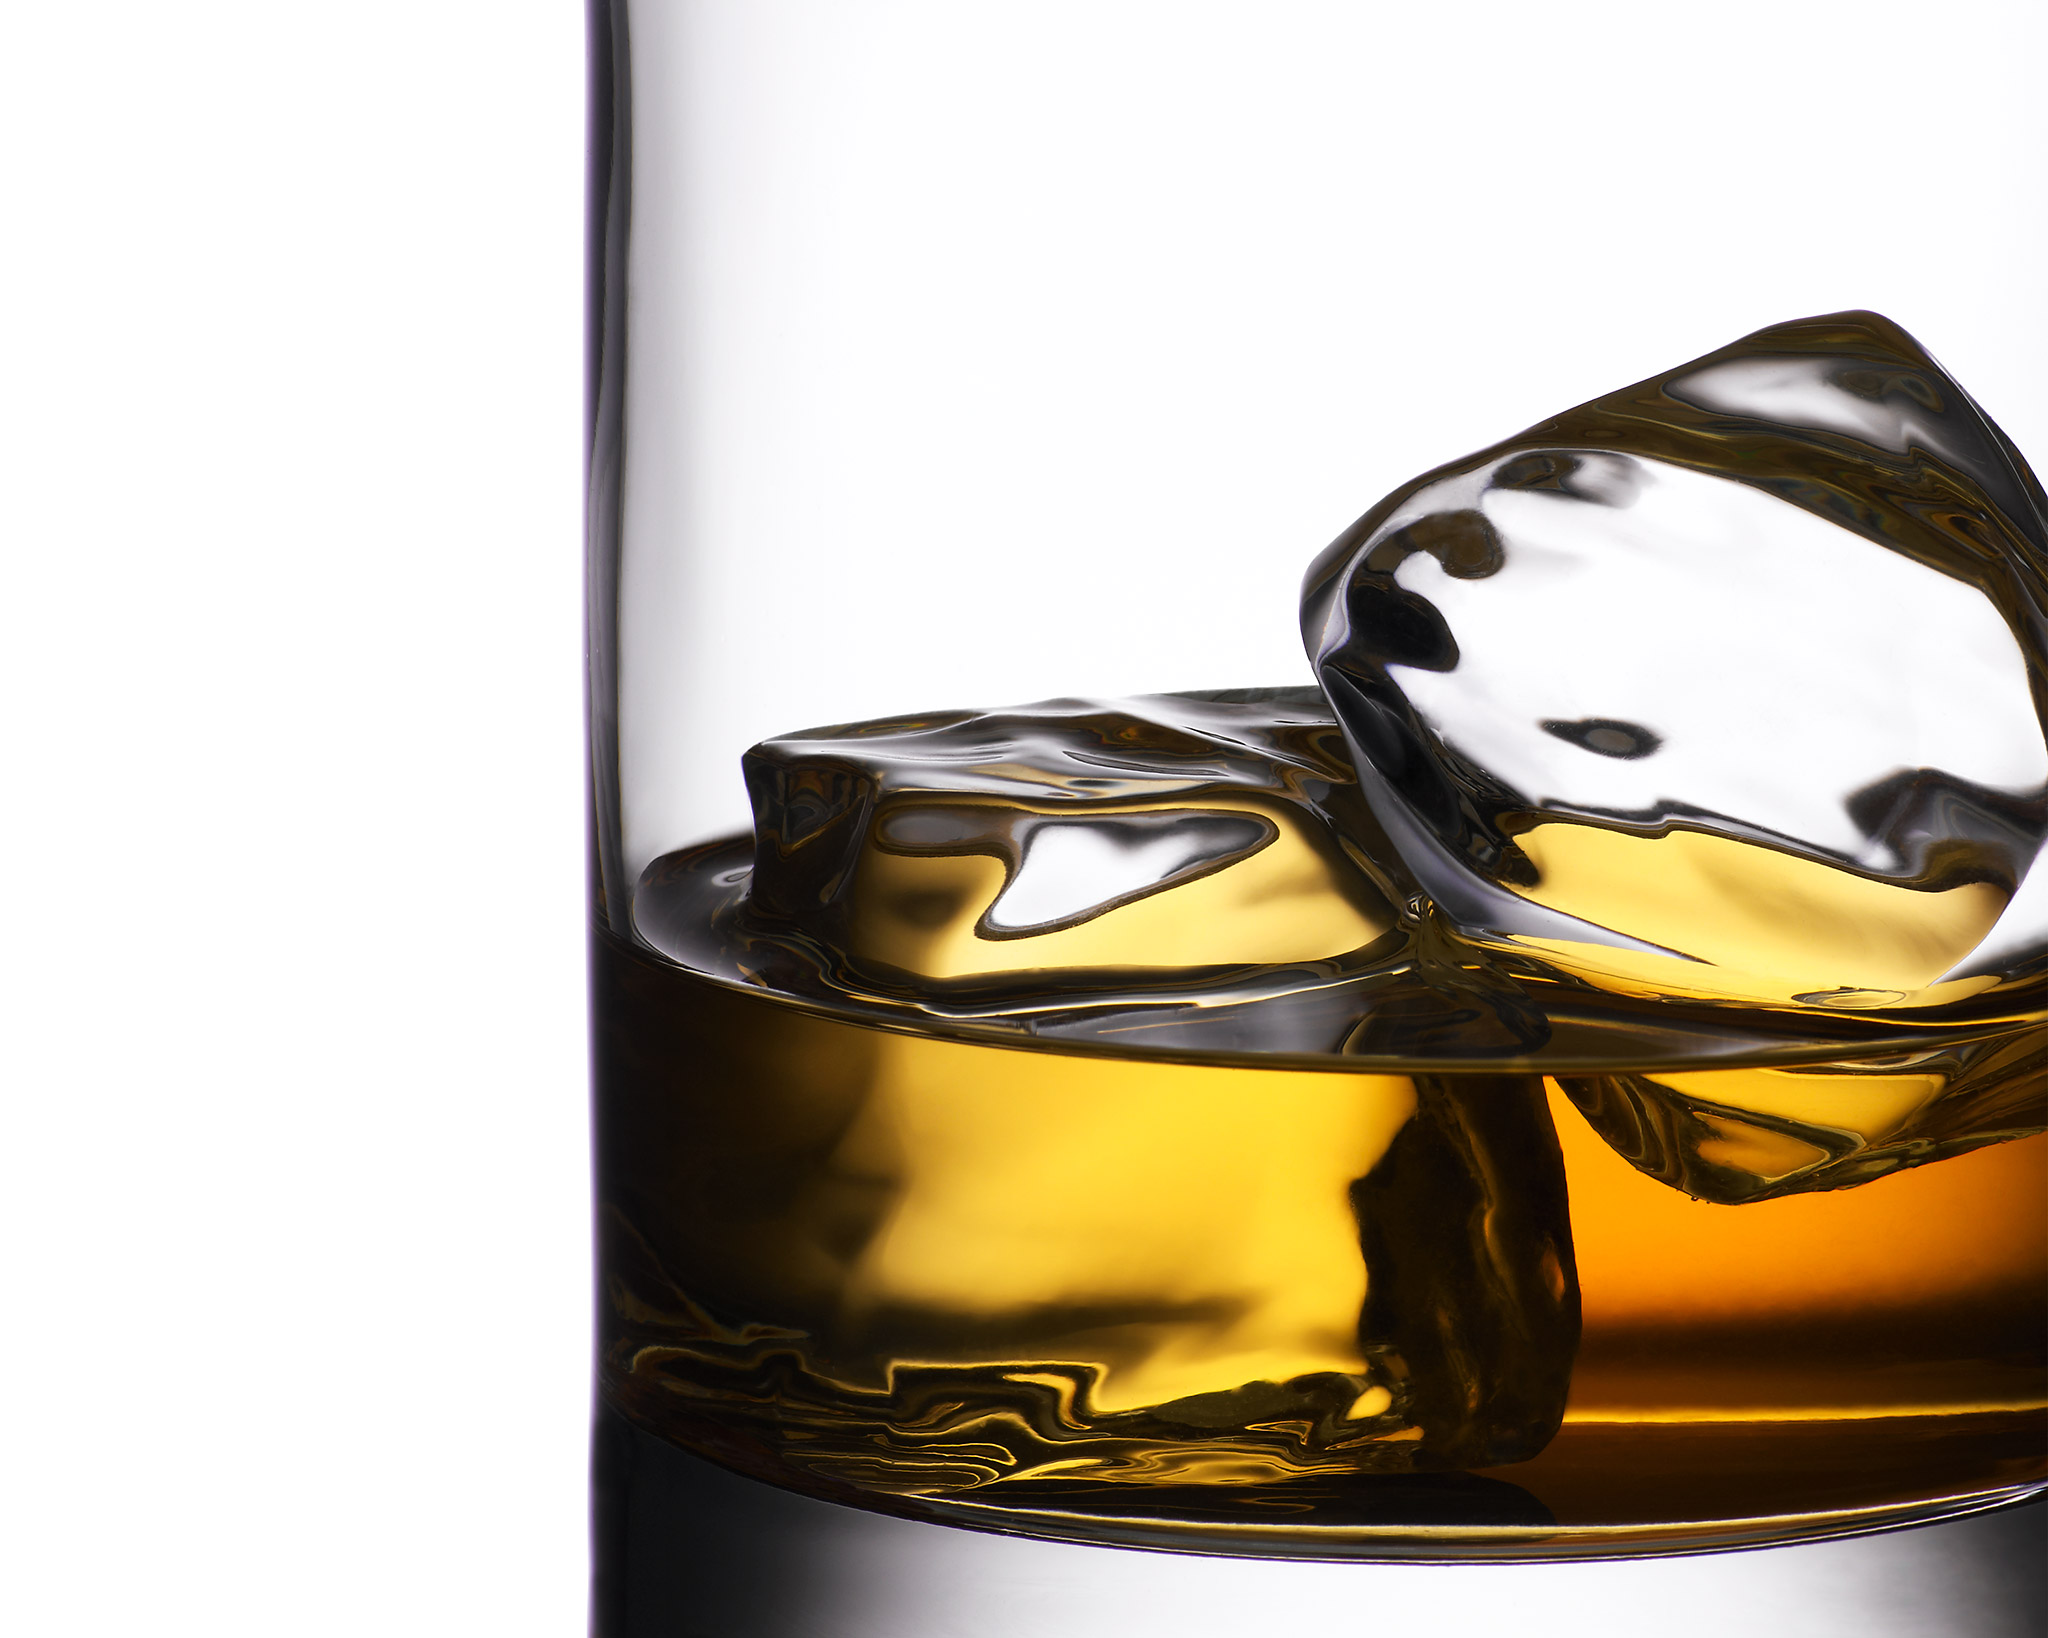 121219-Whiskey-4496-crop.jpg